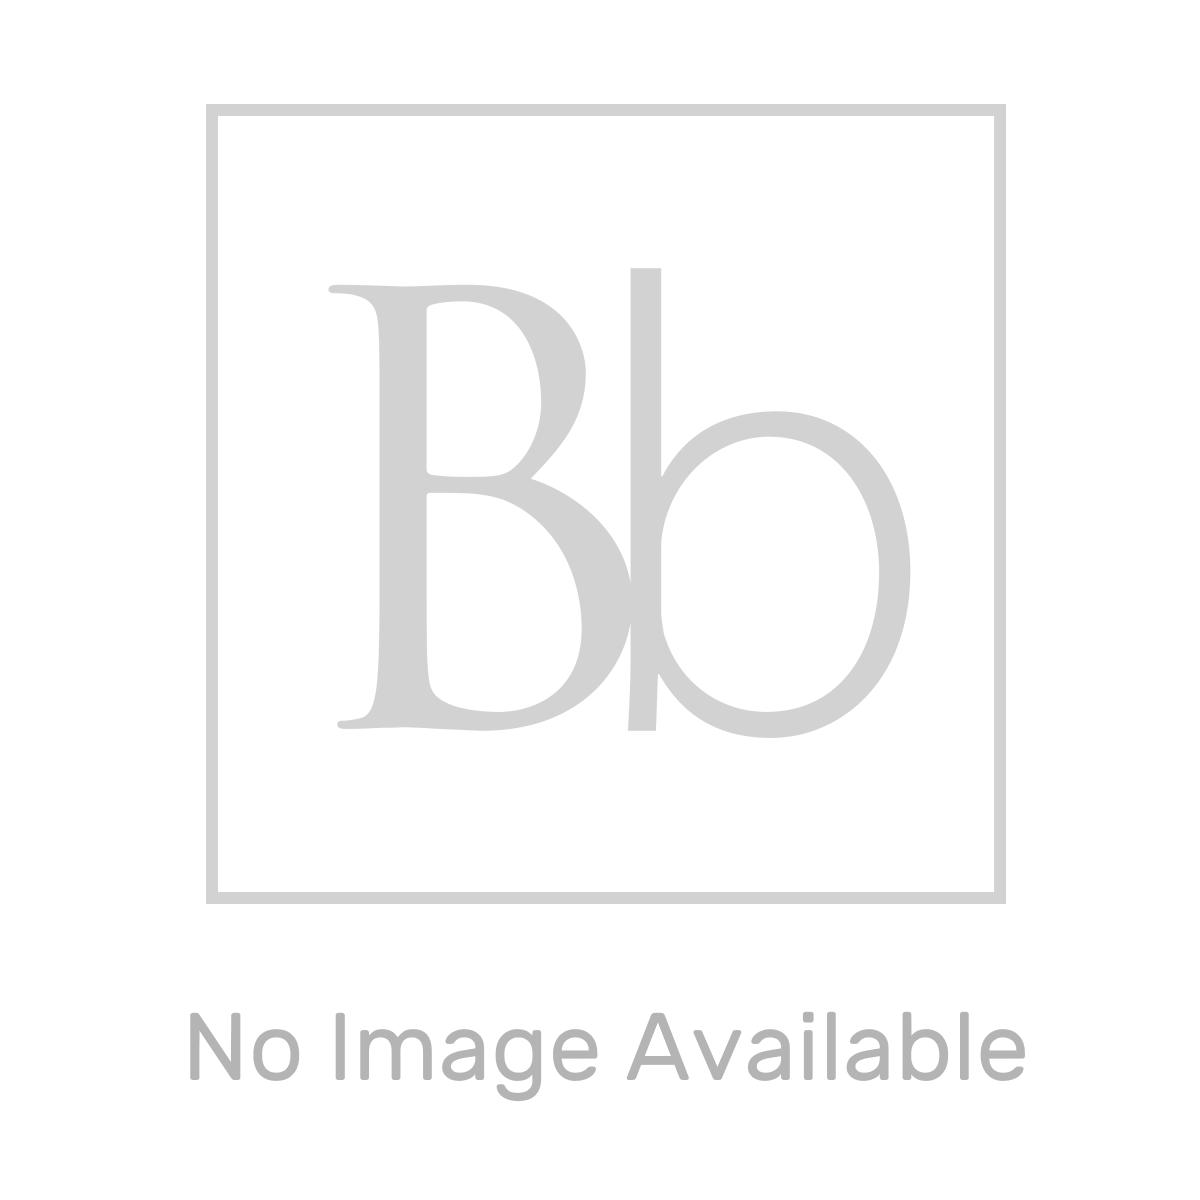 April Rectangular Anti Slip Shower Tray 1500 x 800 Line Drawing